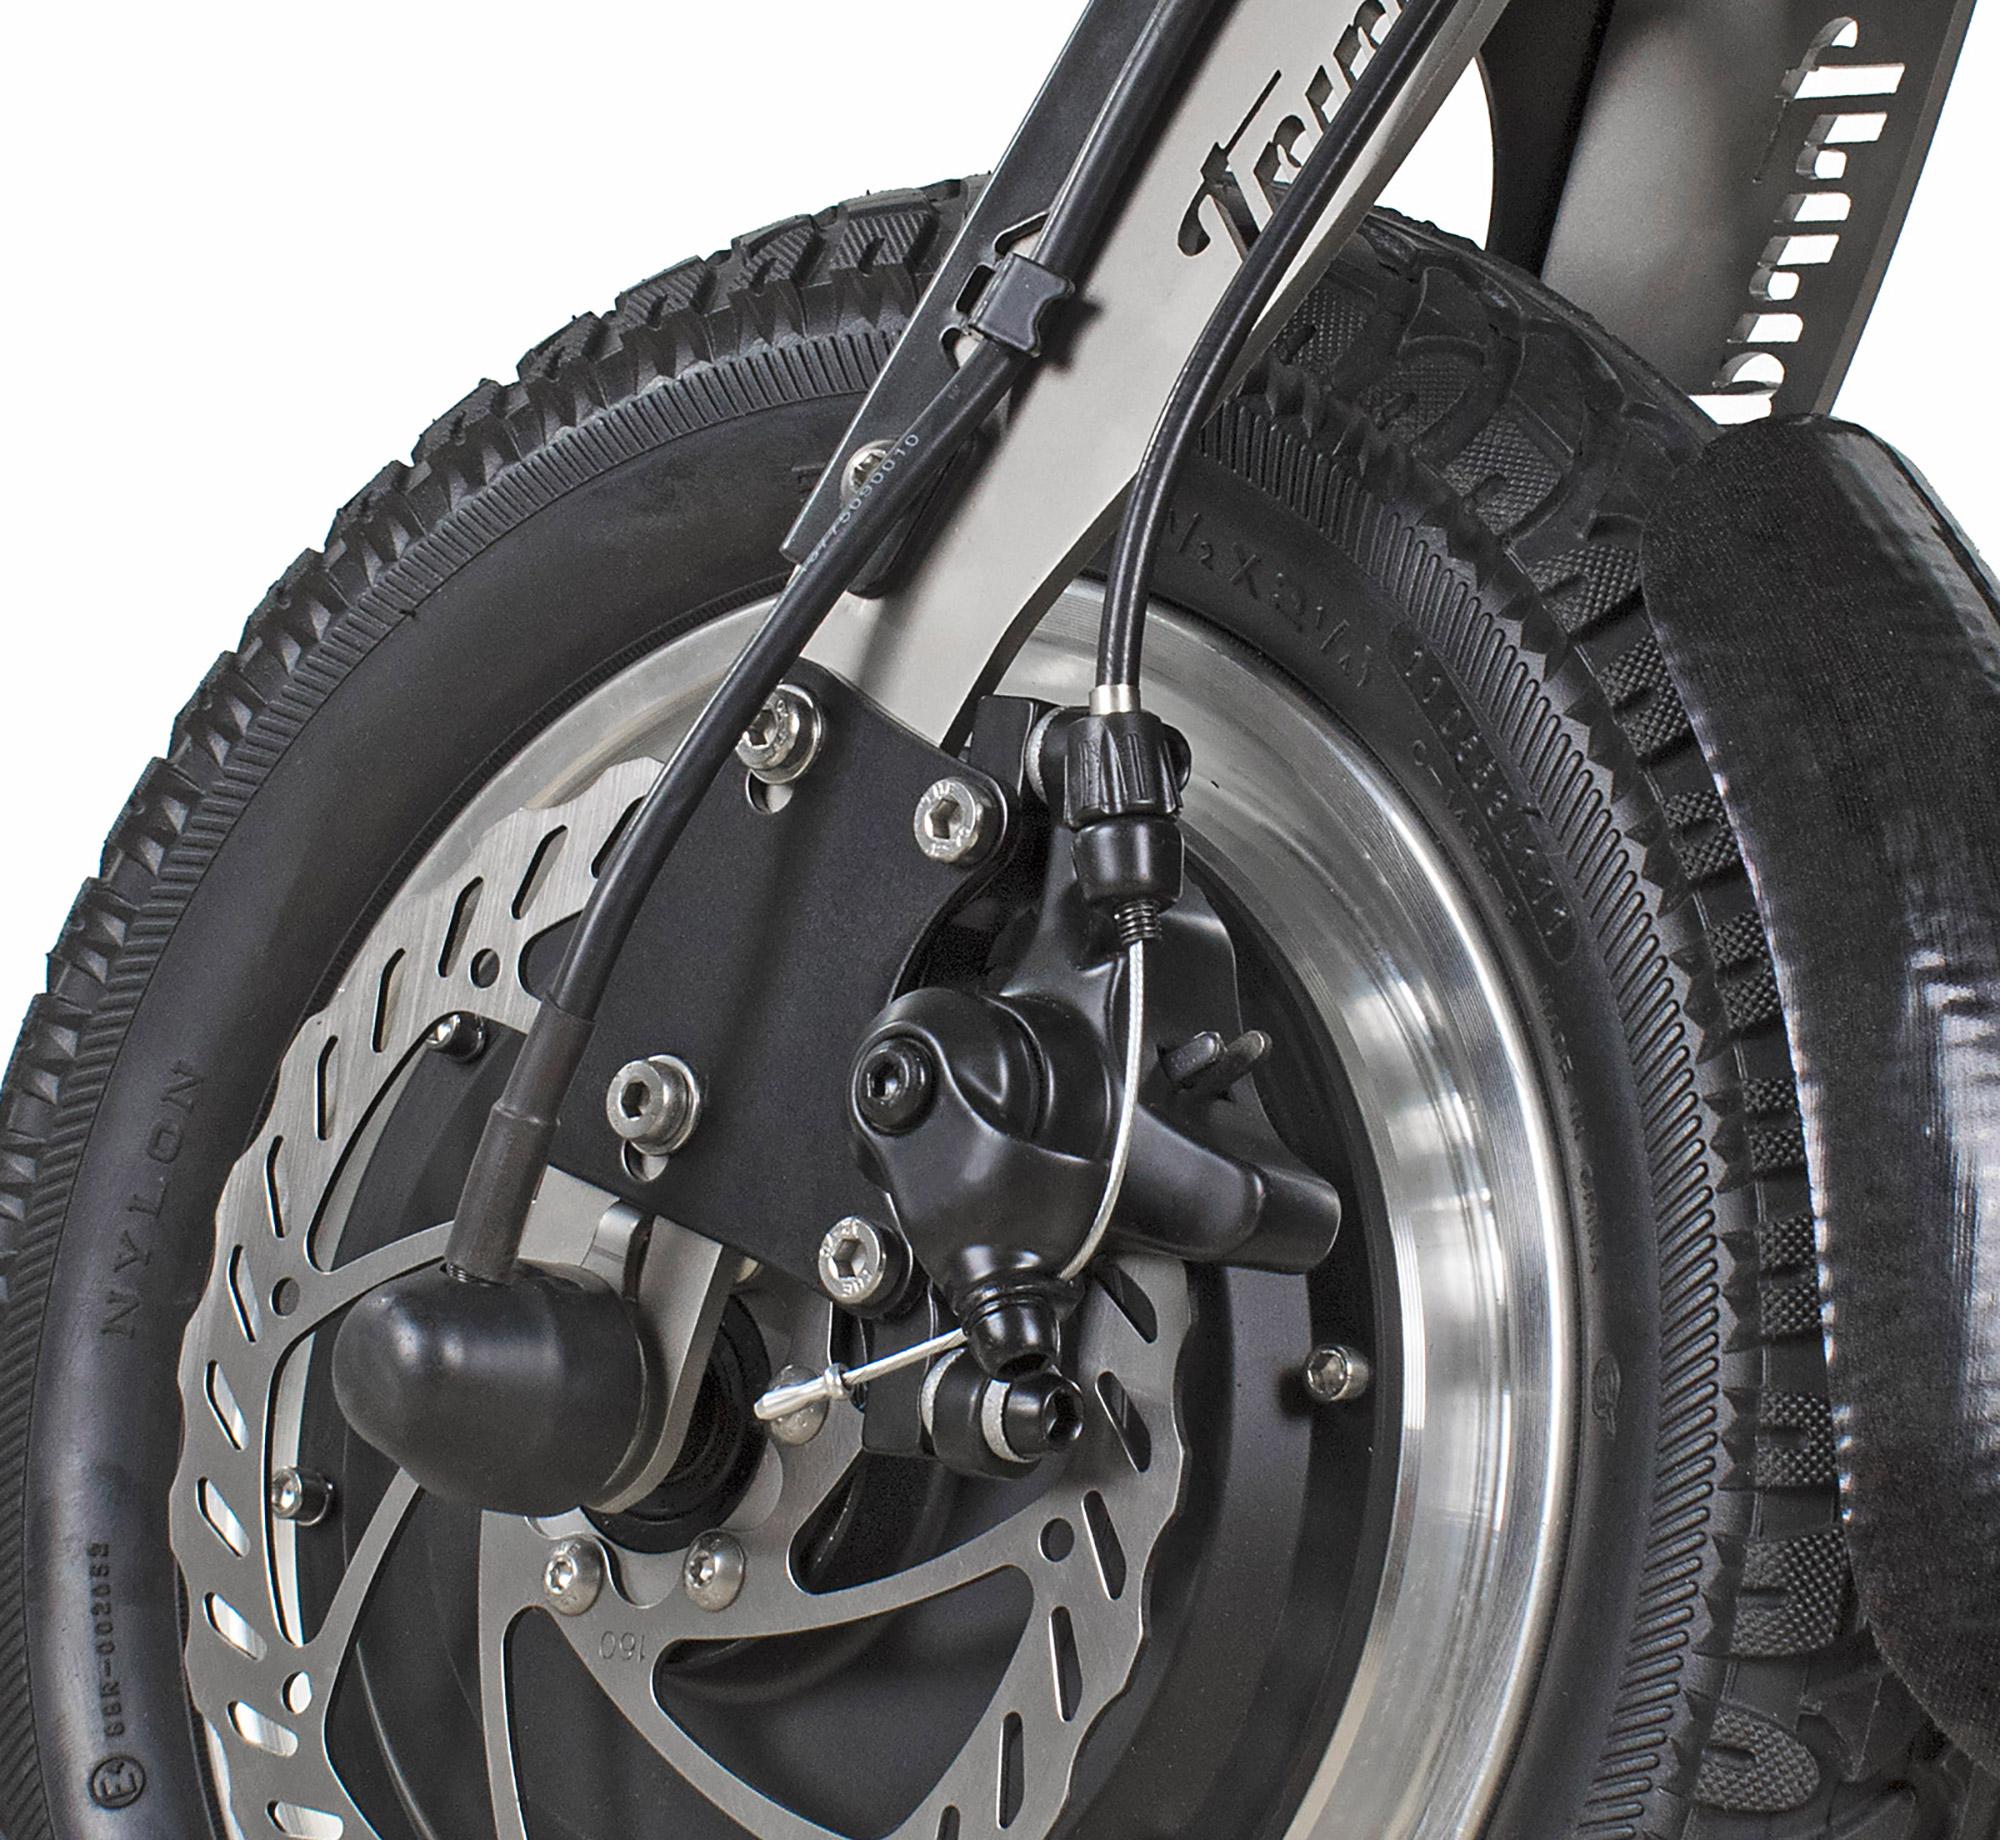 triride-special-compact-dettaglio-ruota.jpg